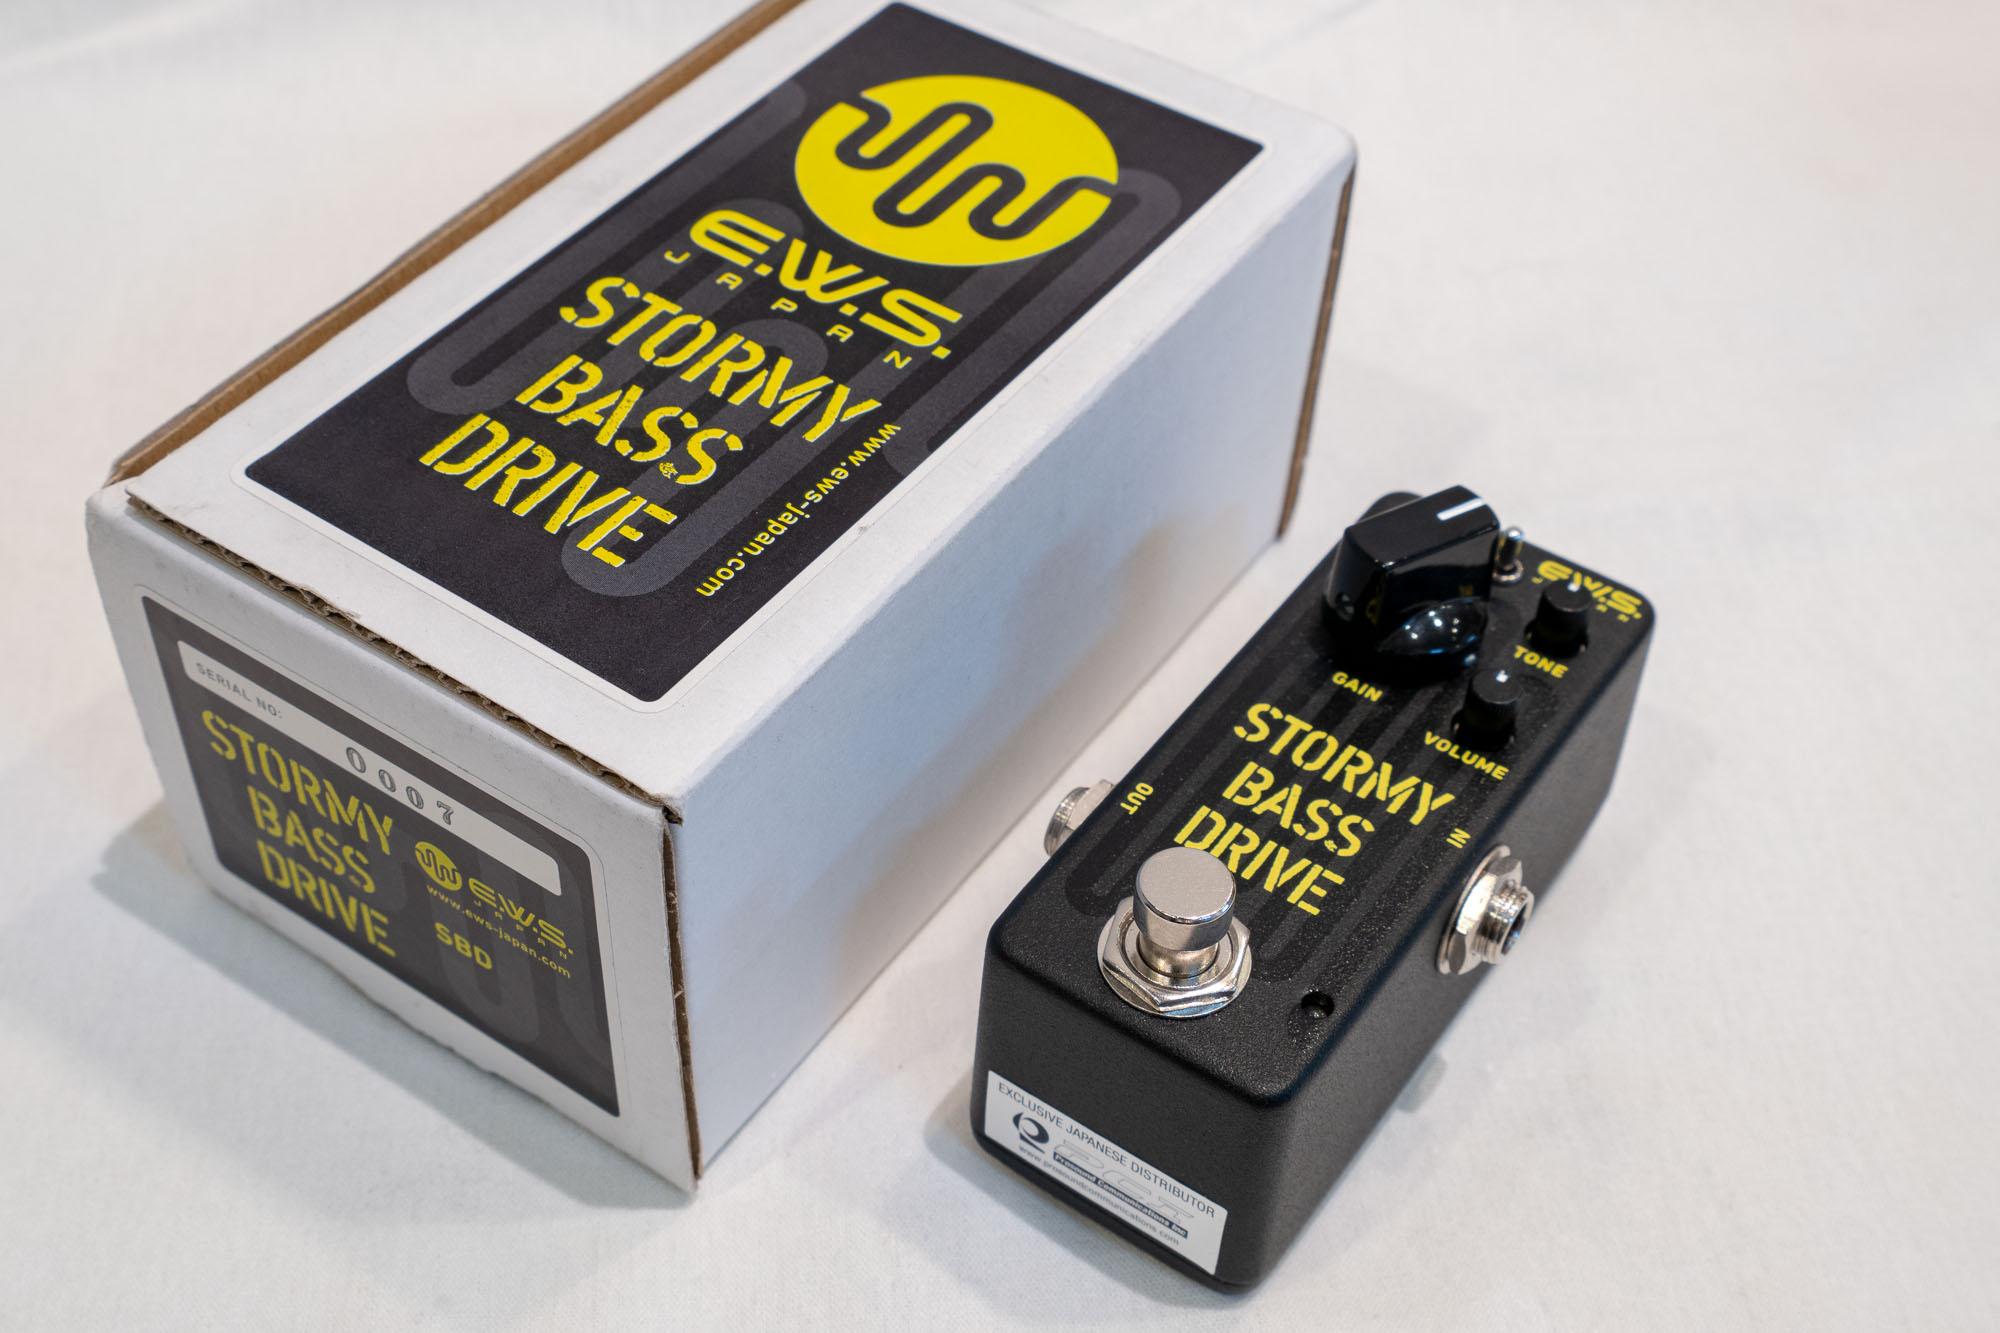 ews-stormy-bass-drive